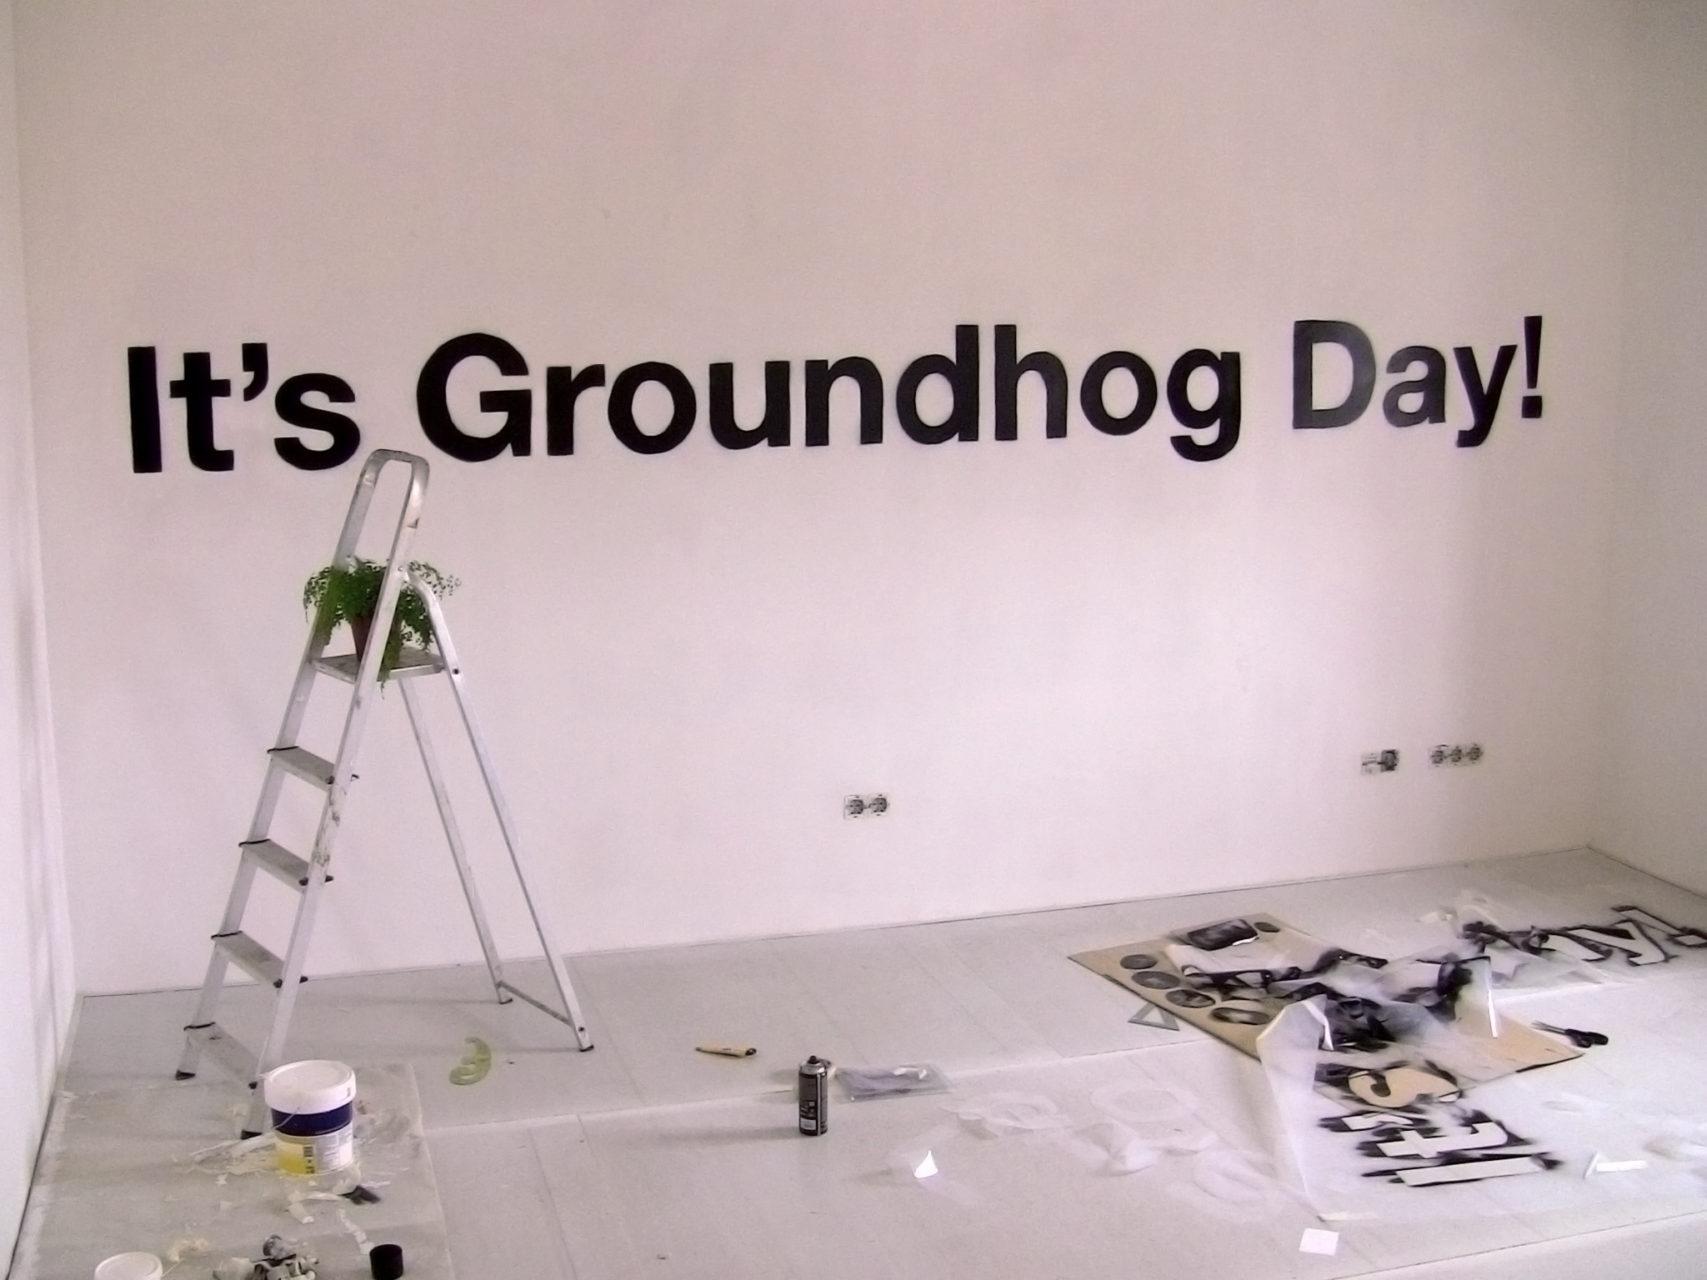 It's Groundhog Day!